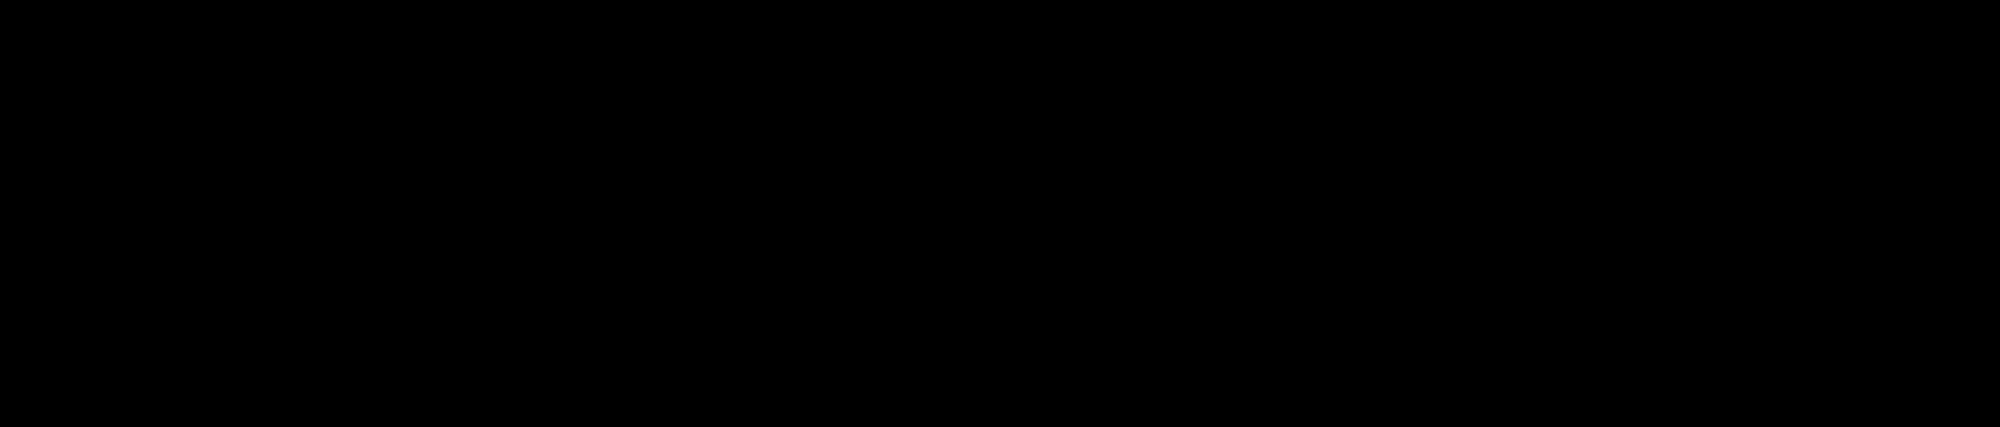 Lamborghini_logo_(2).png